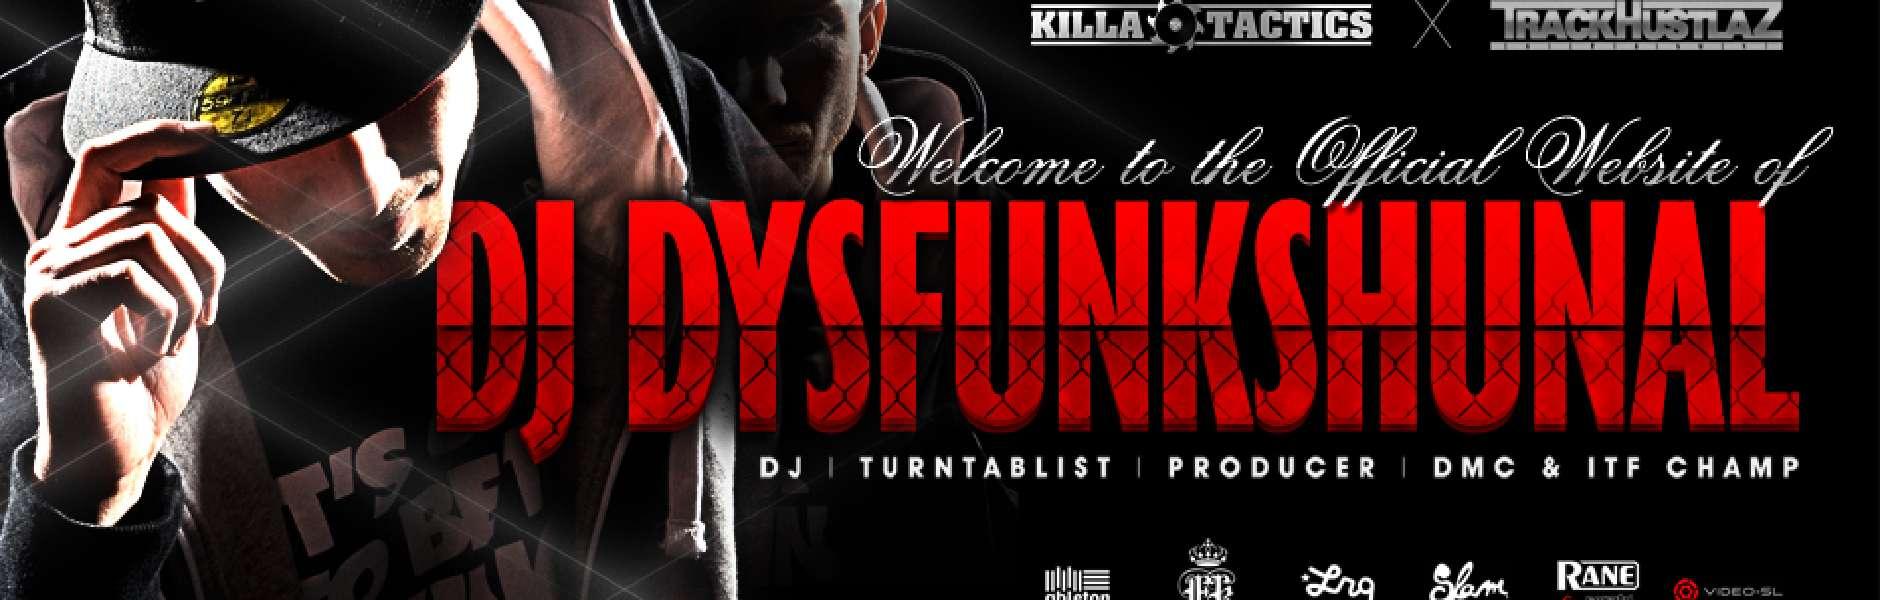 DJ_DYSFUNKSHUNAL